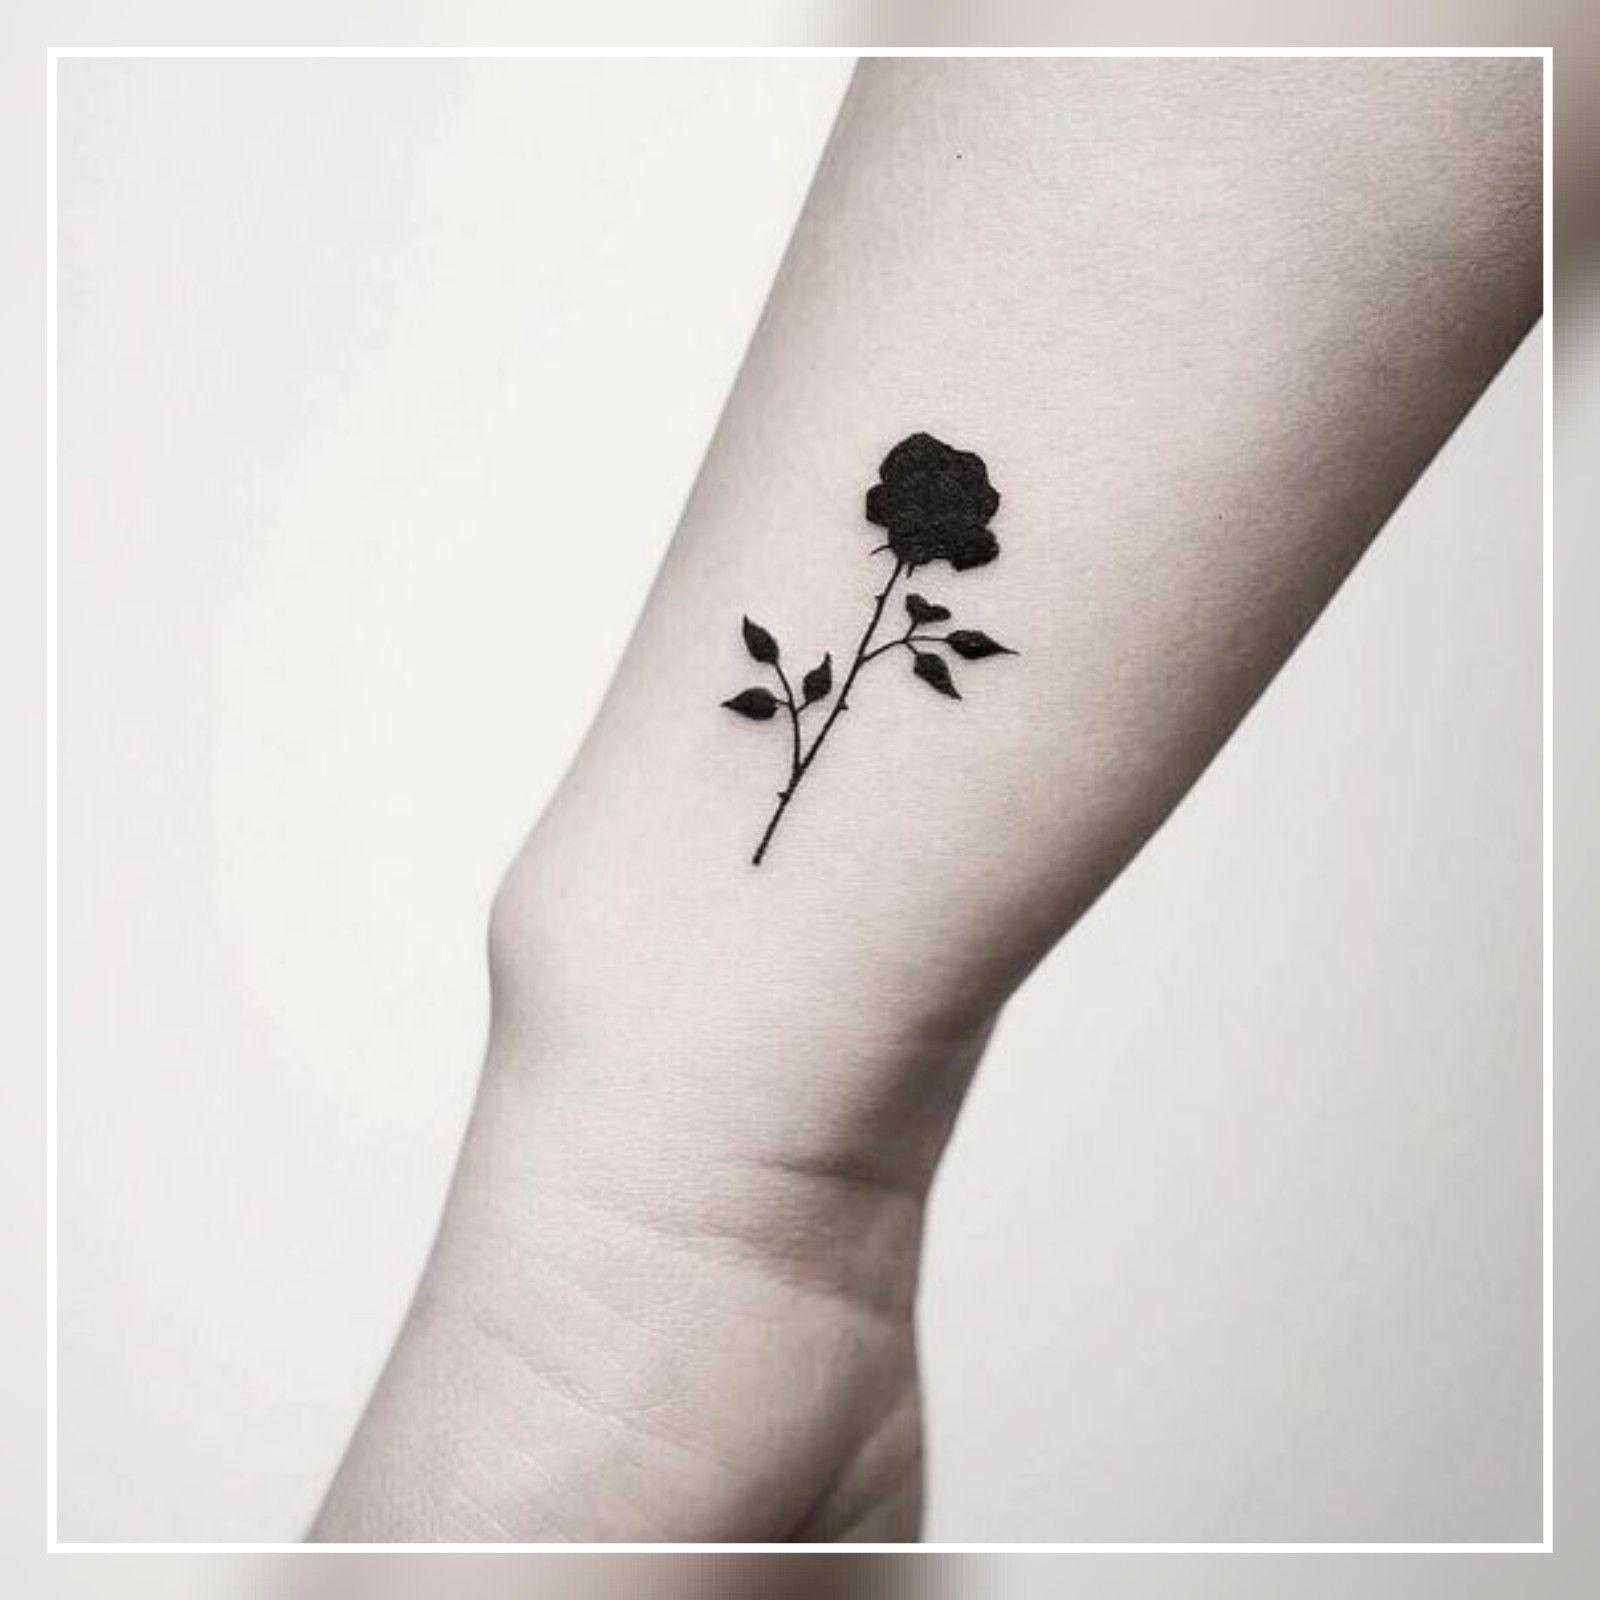 33 Tiny Rose Tattoo Ideas Tattoo Small Rose Tattoo Small Black Tattoos Black Rose Tattoos